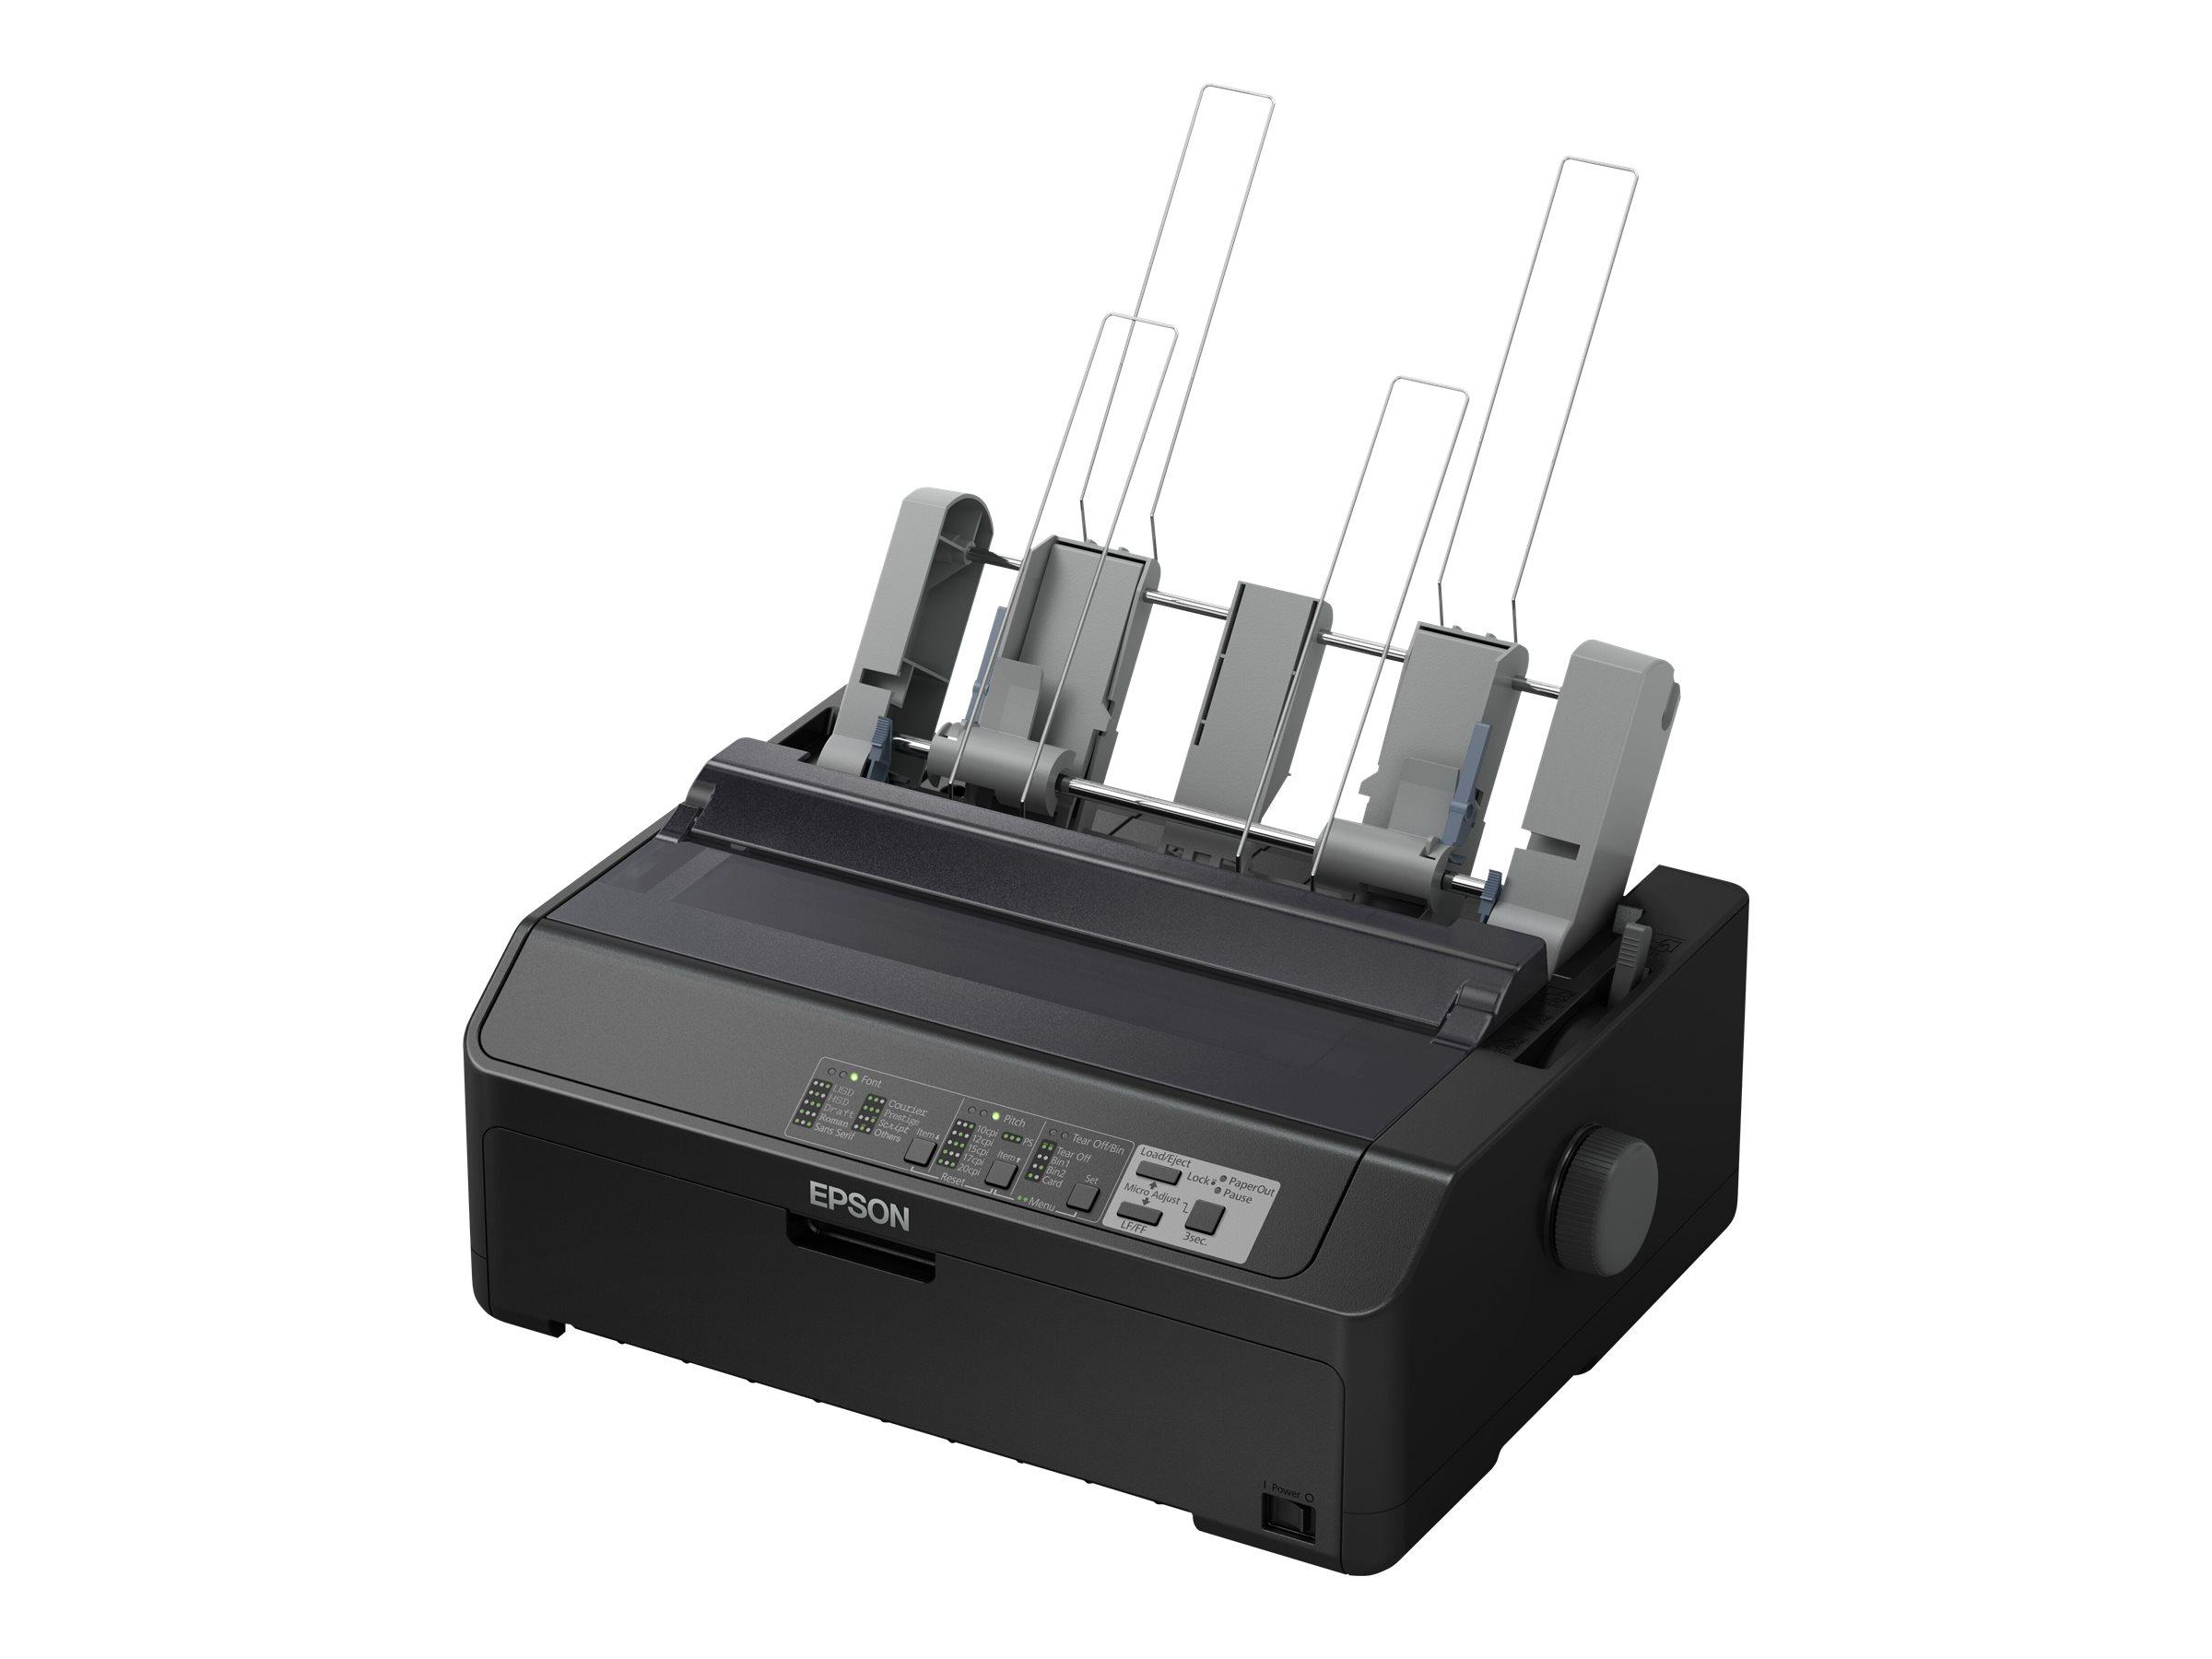 Epson LQ 590II - Drucker - s/w - Punktmatrix - Rolle (21,6 cm), JIS B4, 254 mm (Breite) - 360 x 180 dpi